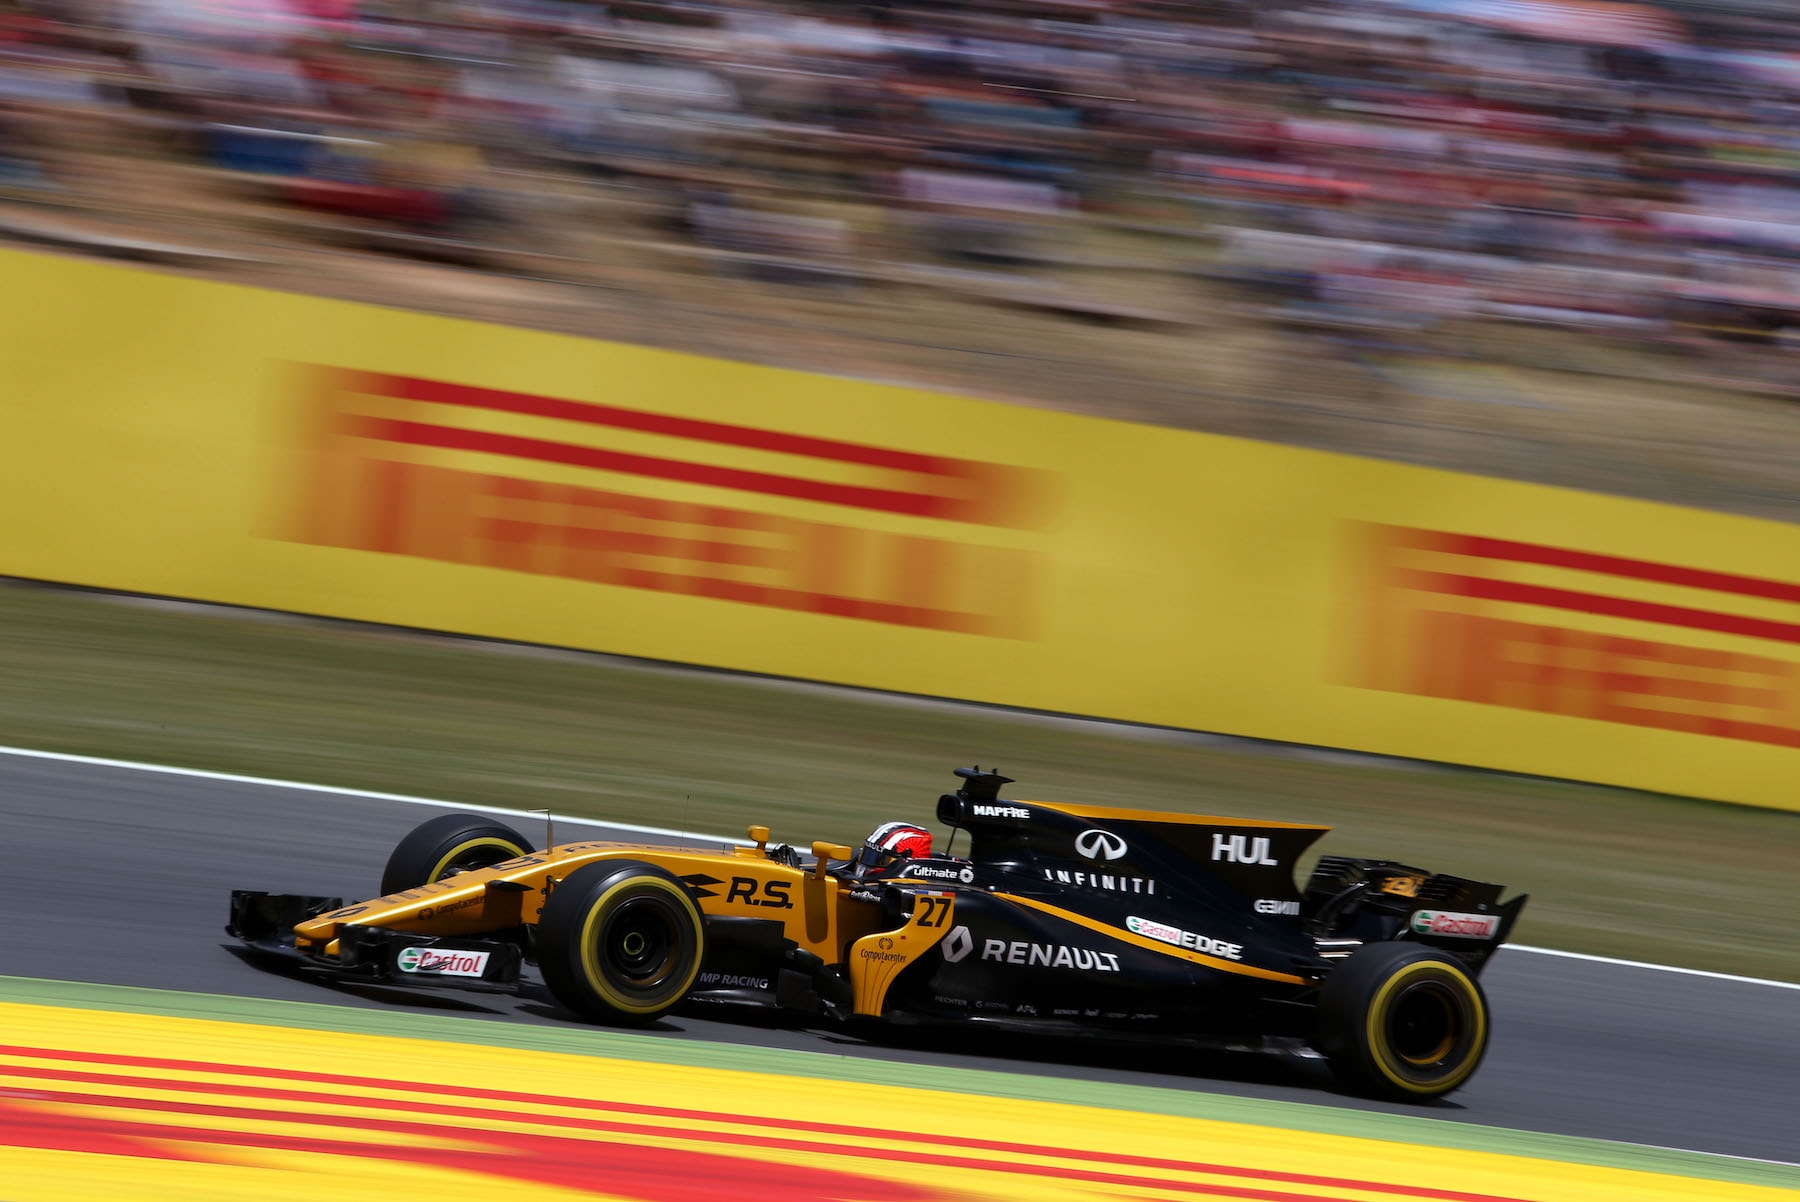 G 2017 Nico Hulkenberg | Renault RS17 | 2017 Spanish GP 2 copy.jpg